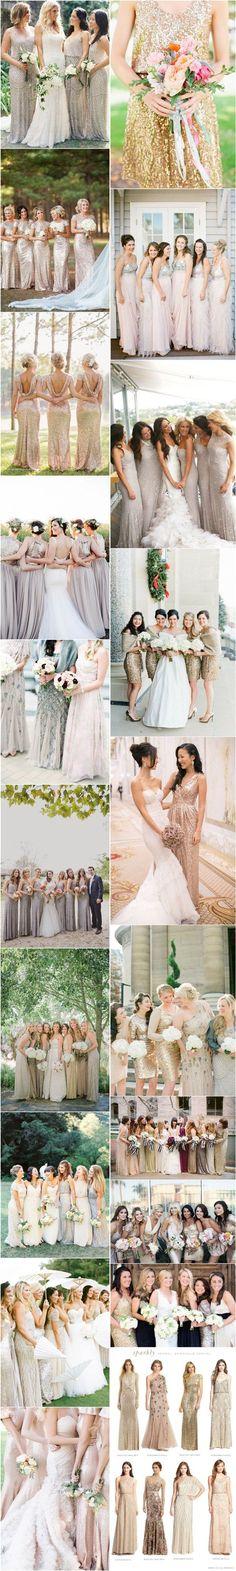 2015 Wedding Trends – Sequined and Metallic Bridesmaid Dresses | http://www.deerpearlflowers.com/2015-wedding-trends-sequined-metallic-bridesmaid-dresses/